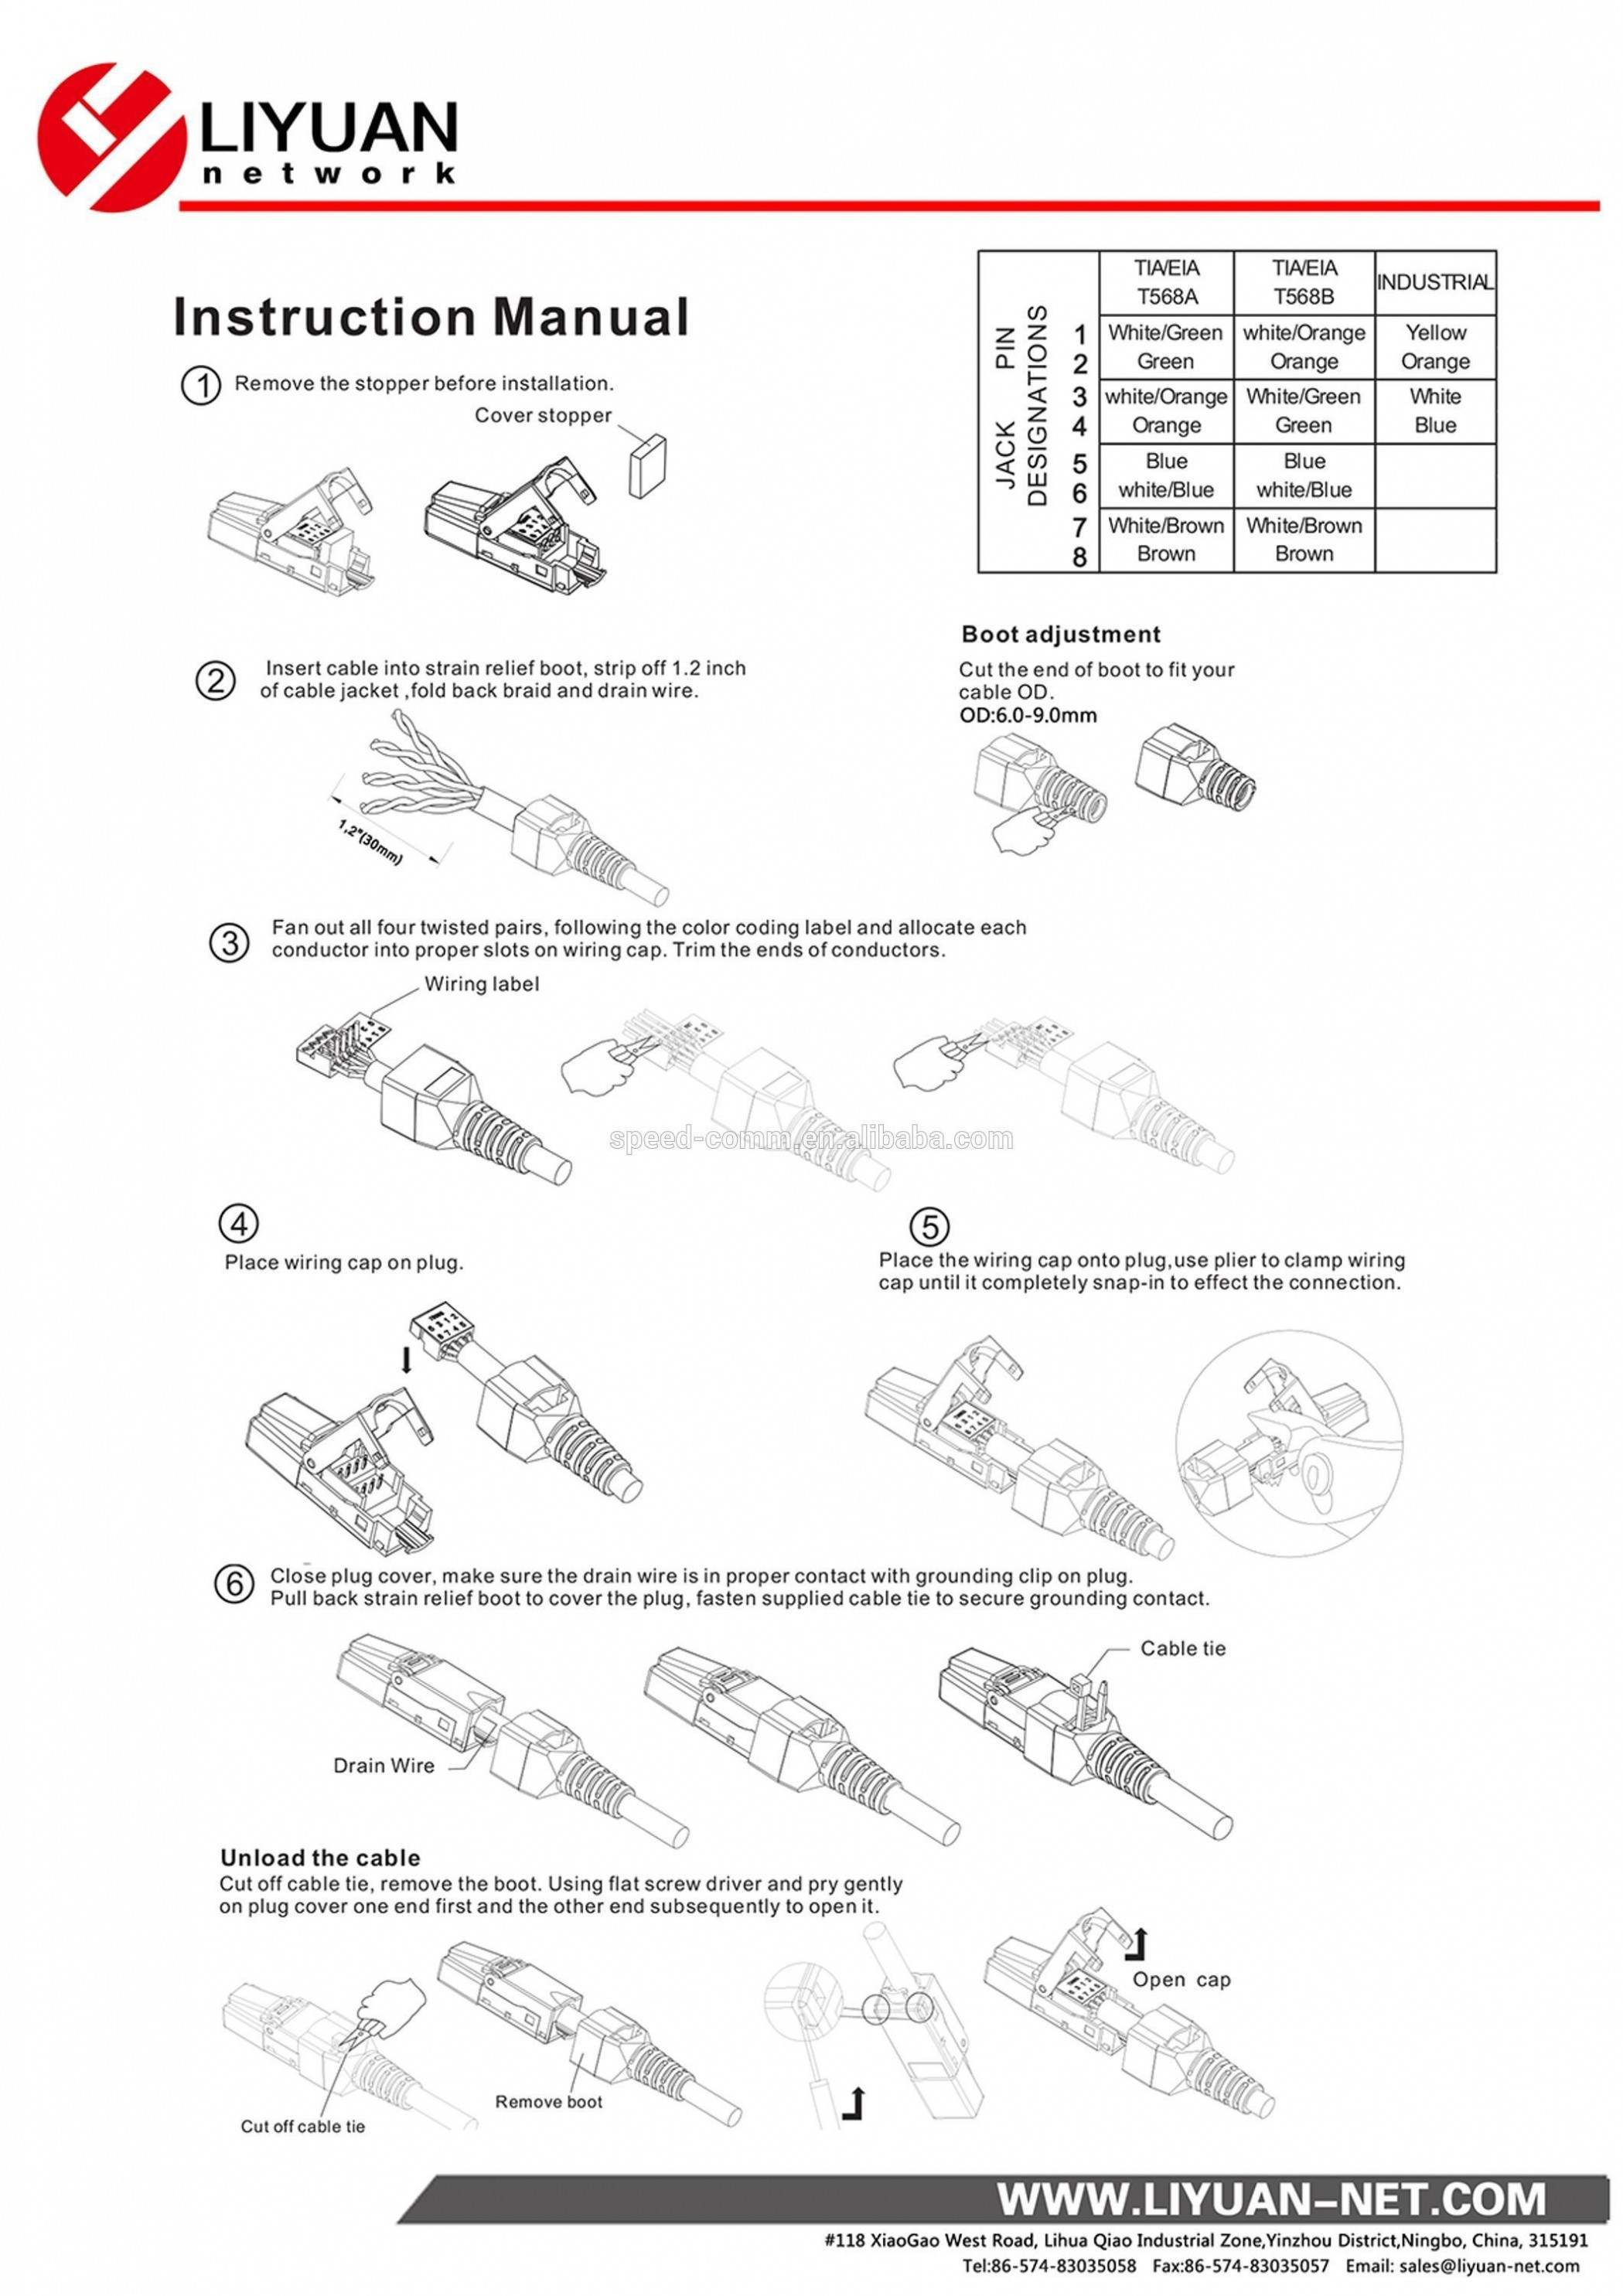 Car Alternator Diagram Chrysler Wiring Diagrams New Dodge Ram Alternator Fresh 2006 ford Of Car Alternator Diagram Diagram Of G Clamp – Electrical Wiring Diagram software